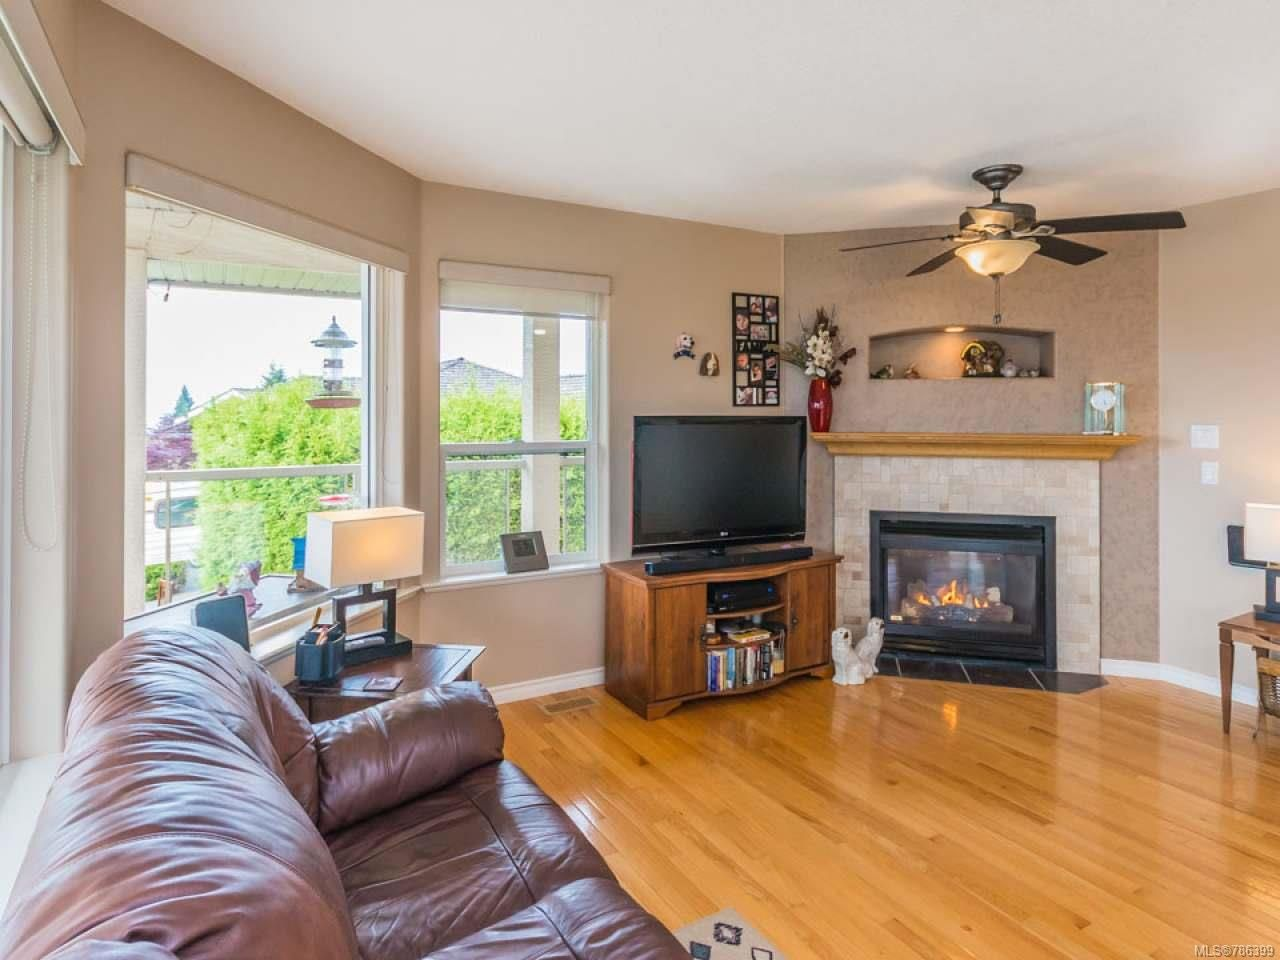 Photo 11: Photos: 5371 HIGHRIDGE PLACE in NANAIMO: Na North Nanaimo House for sale (Nanaimo)  : MLS®# 786399